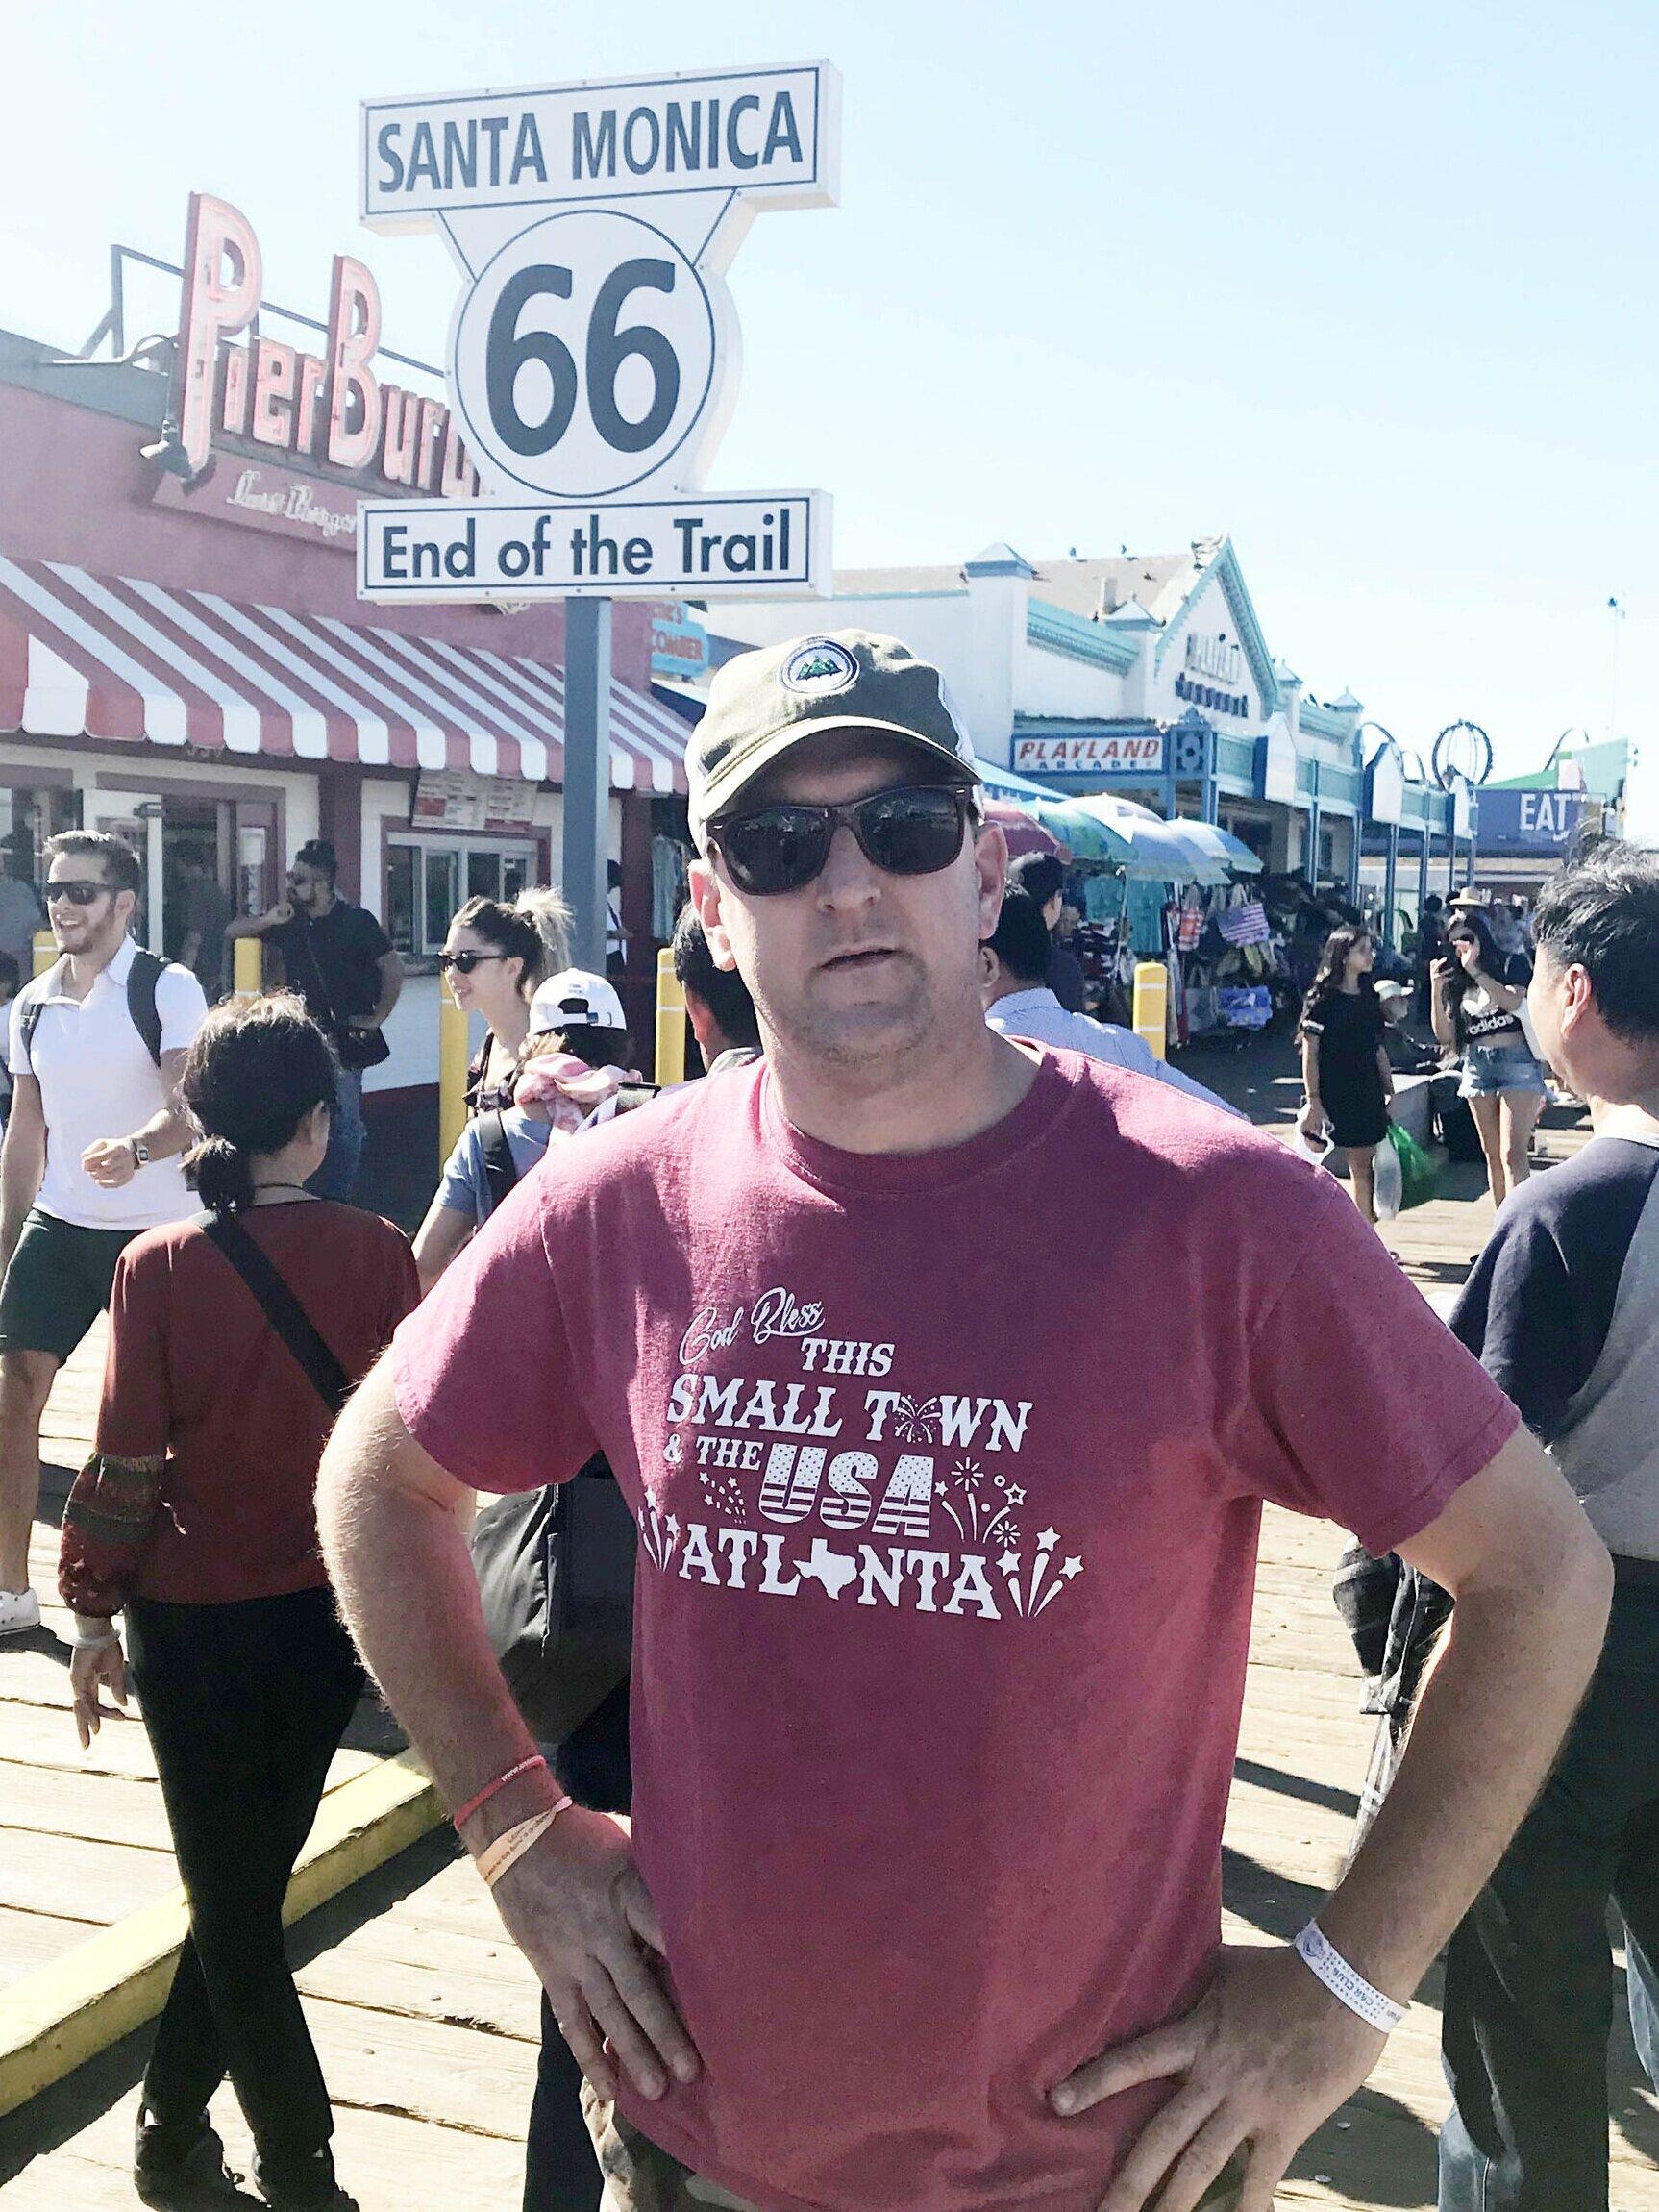 End of the Trail, Santa Monica Pier in Los Angeles, California